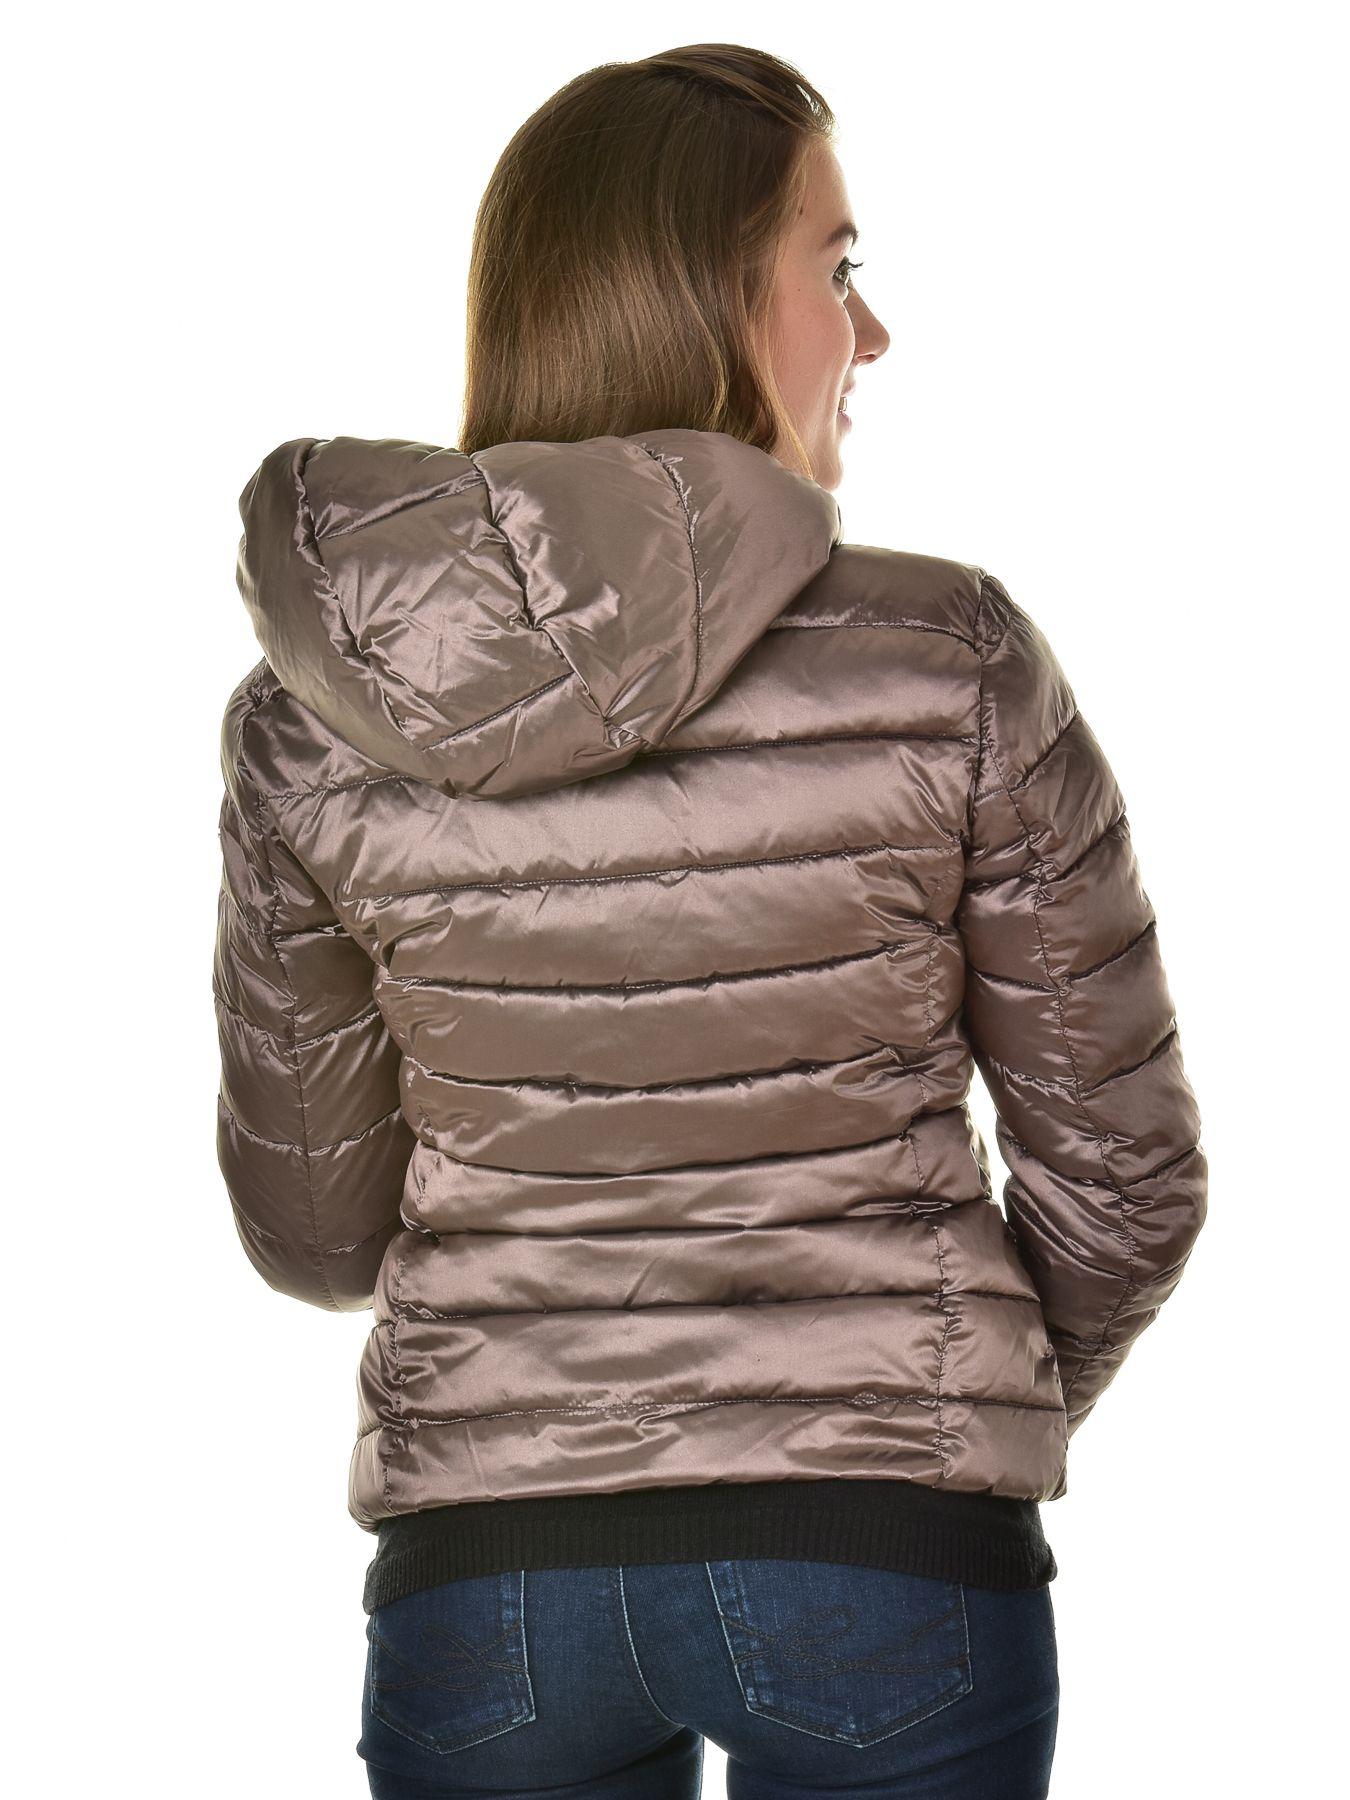 Mayo Chix női átmeneti kabát WOLFY | Markasbolt.hu Hivatalos